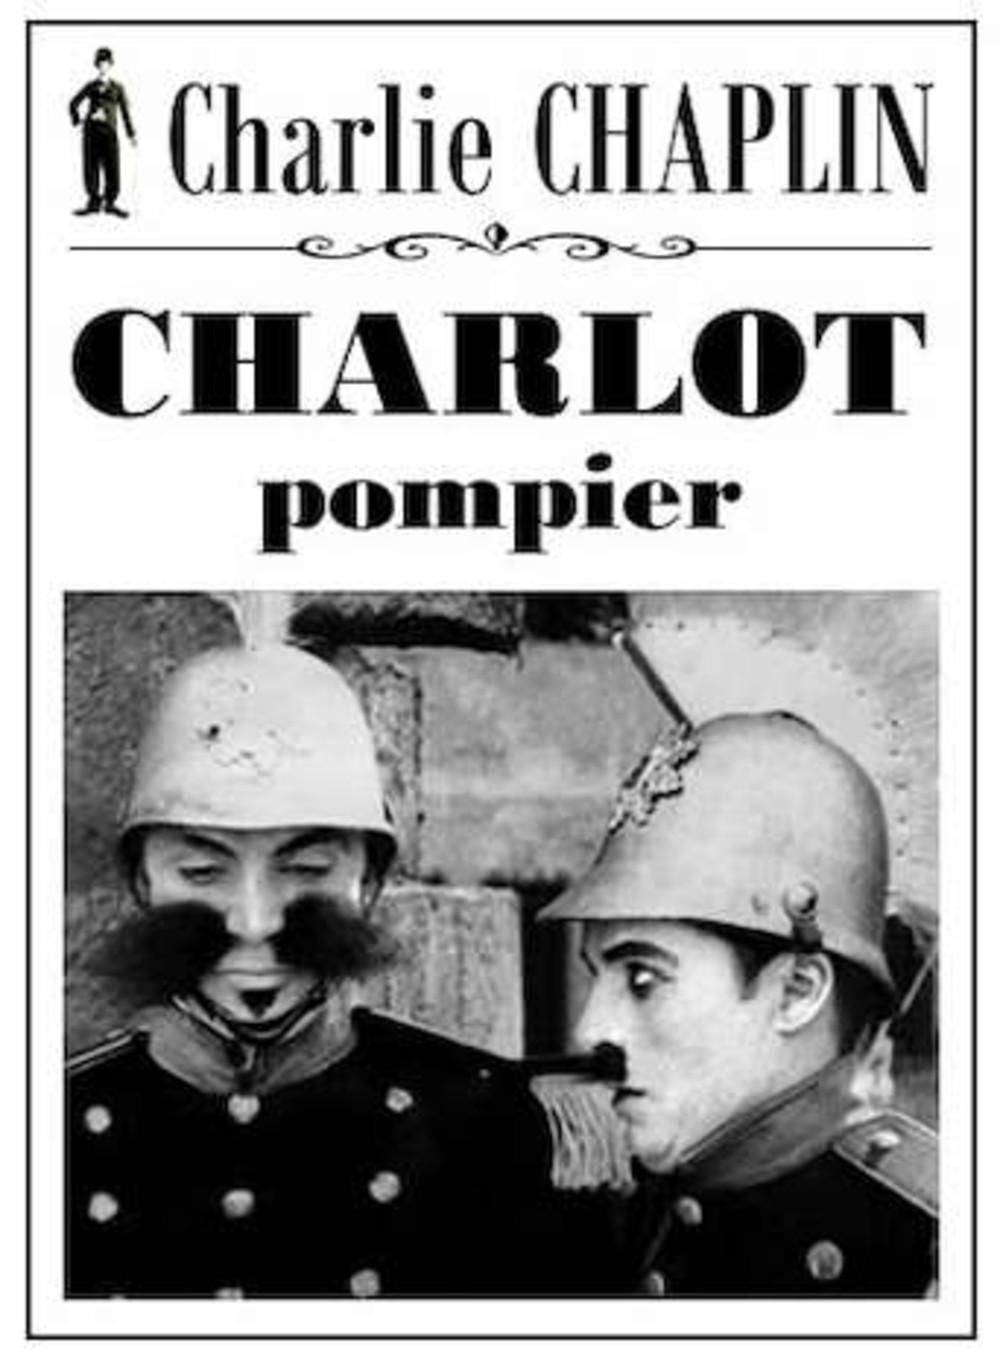 affiche du film Charlot pompier